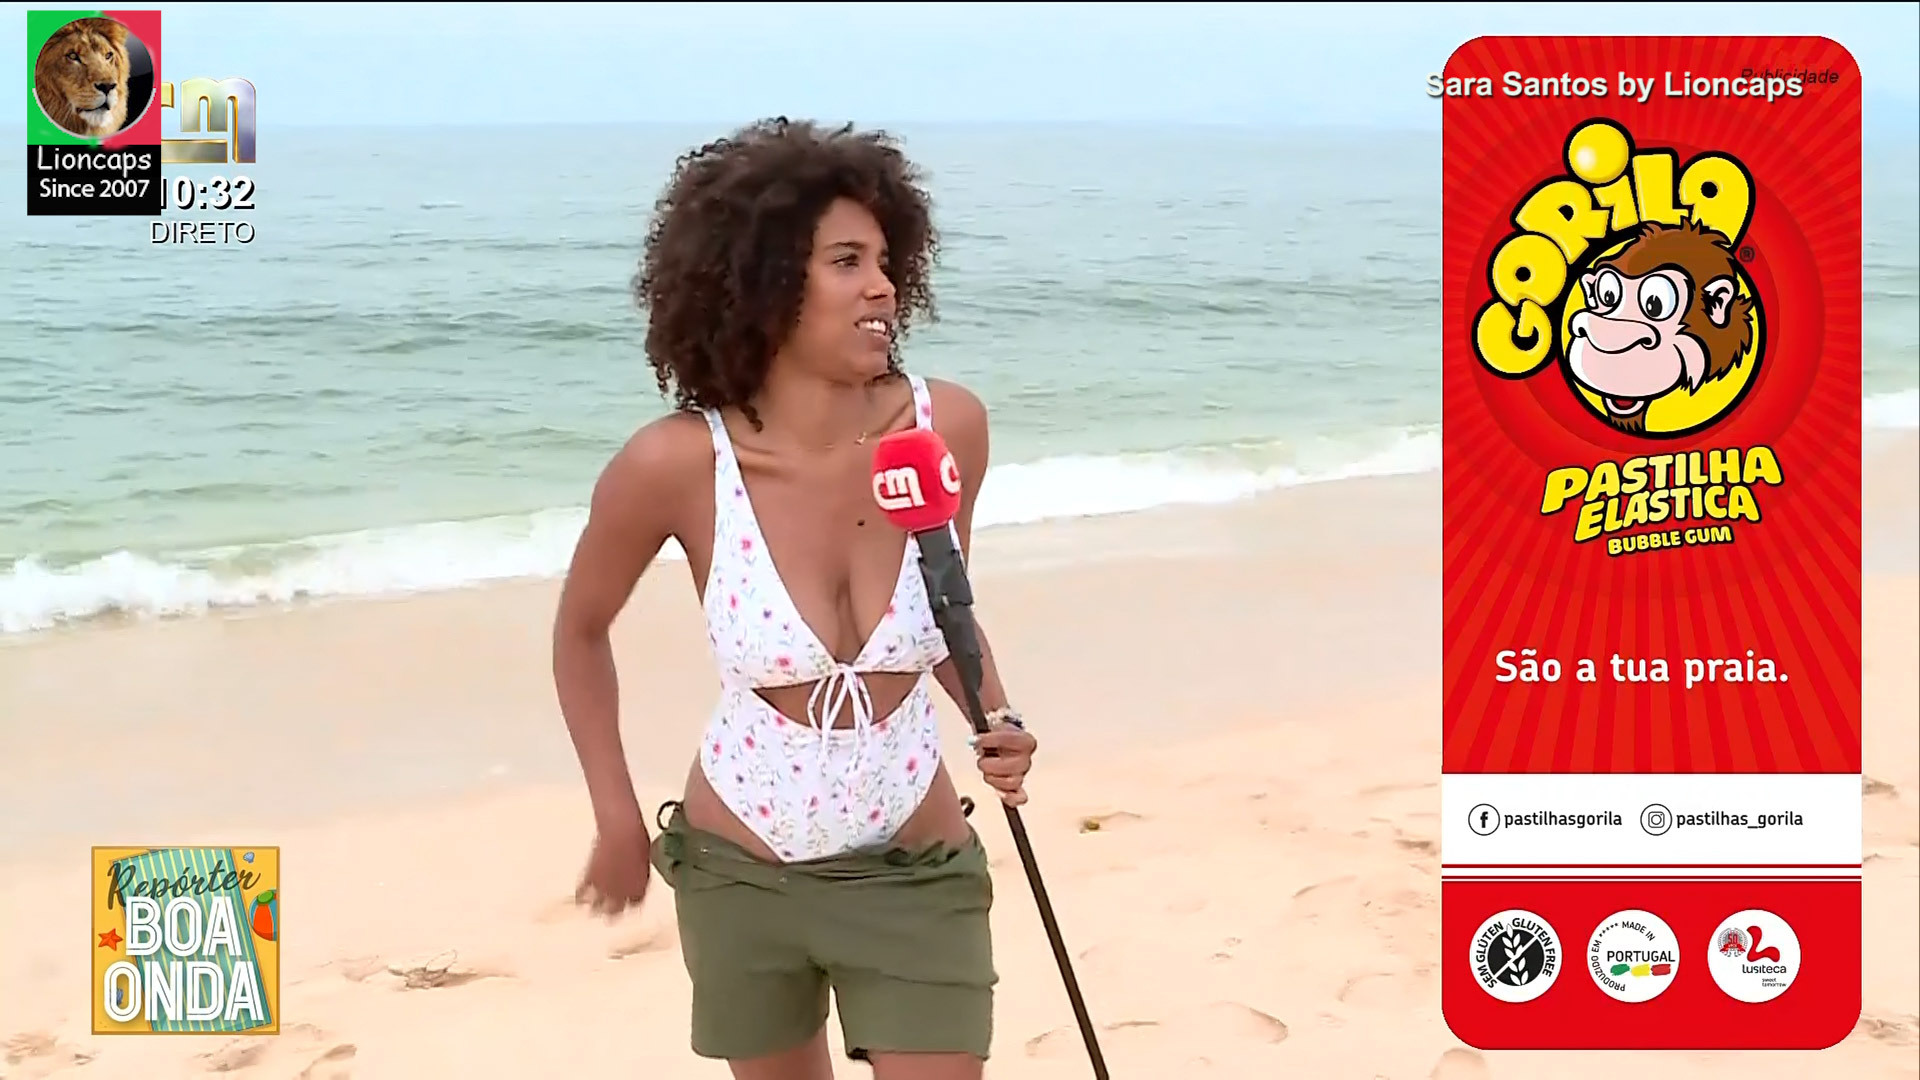 sara_santos_praia_lioncaps_24_07_2021_01 (3).jpg